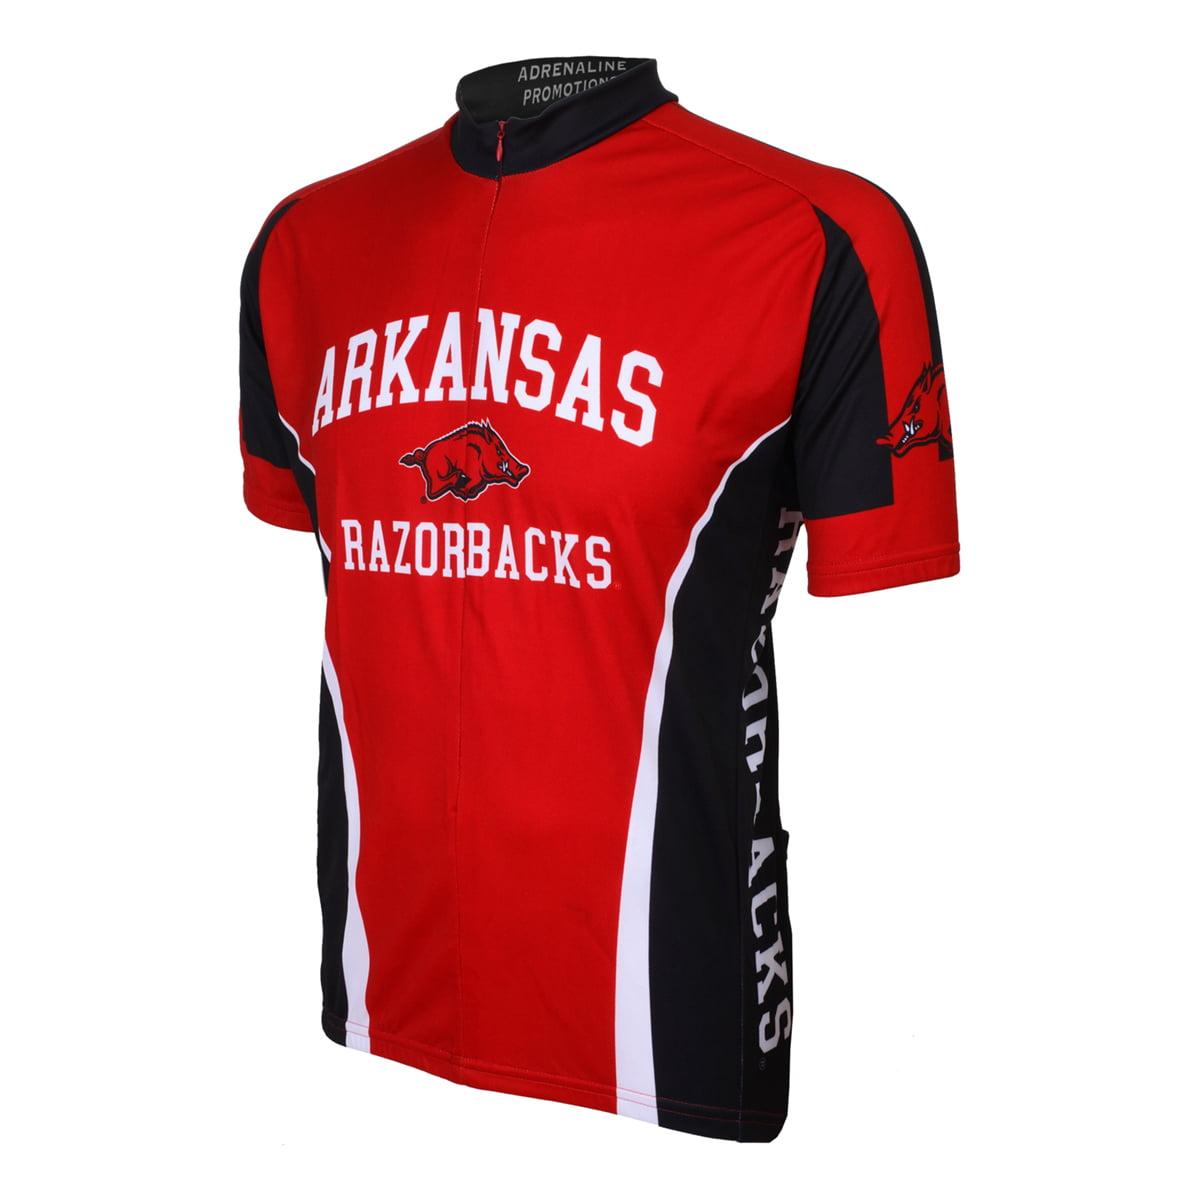 Adrenaline Promotions University of Arkansas Razorbacks Cycling Jersey